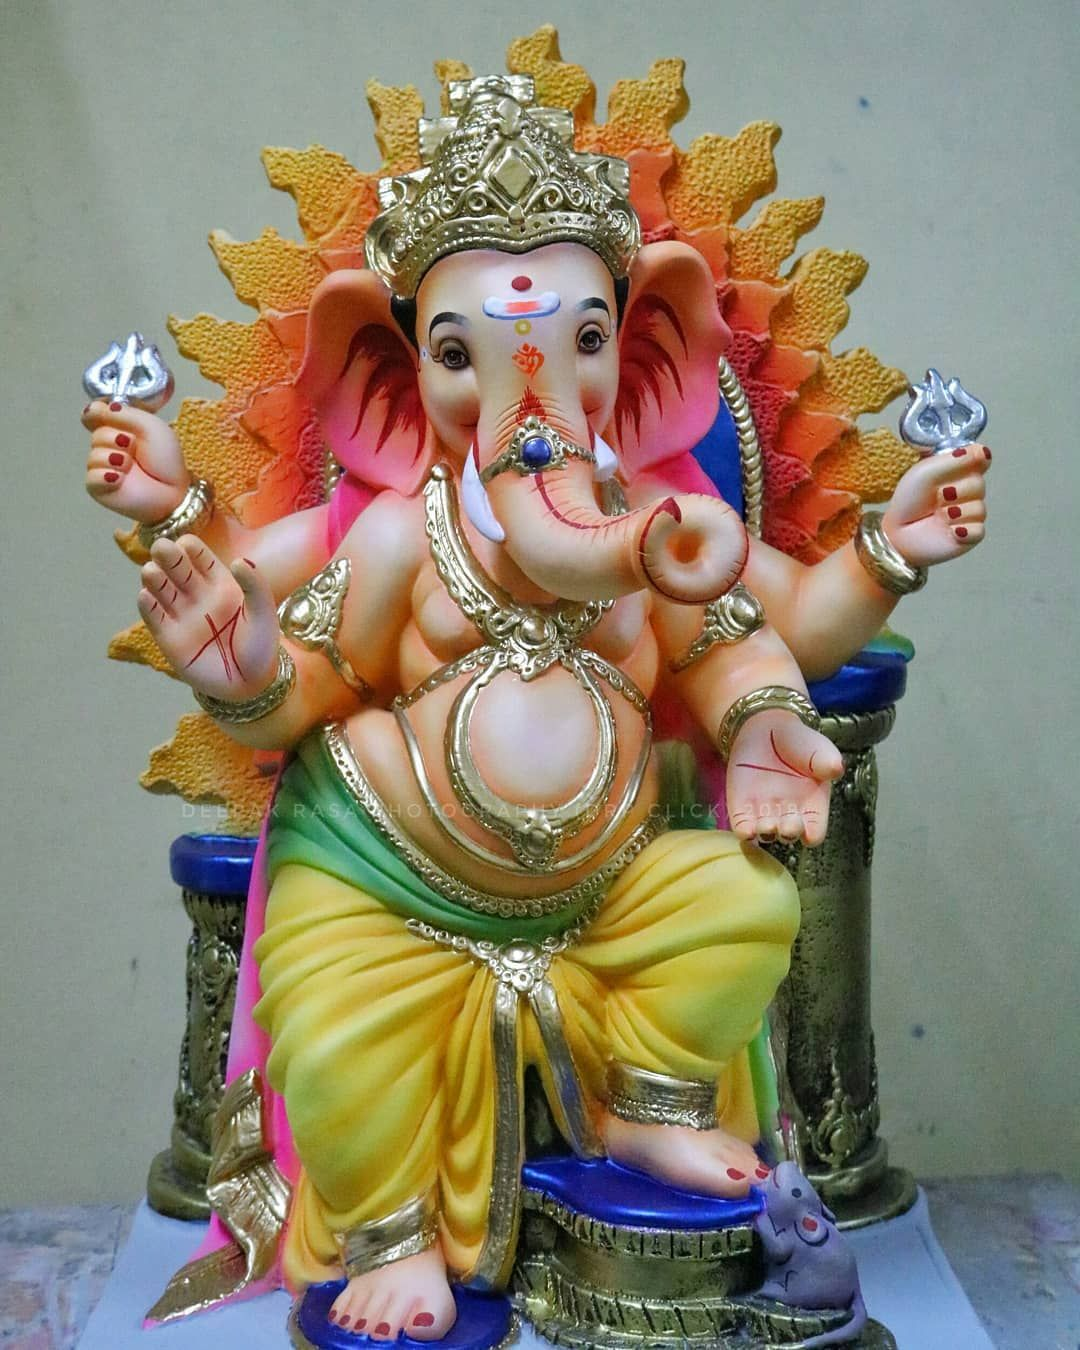 310 Ganpati Bappa Images Free Download Full Hd Pics Photo Gallery And Wallpapers 2020 Good Mo In 2020 Shri Ganesh Images Ganesha Pictures Lord Ganesha Paintings